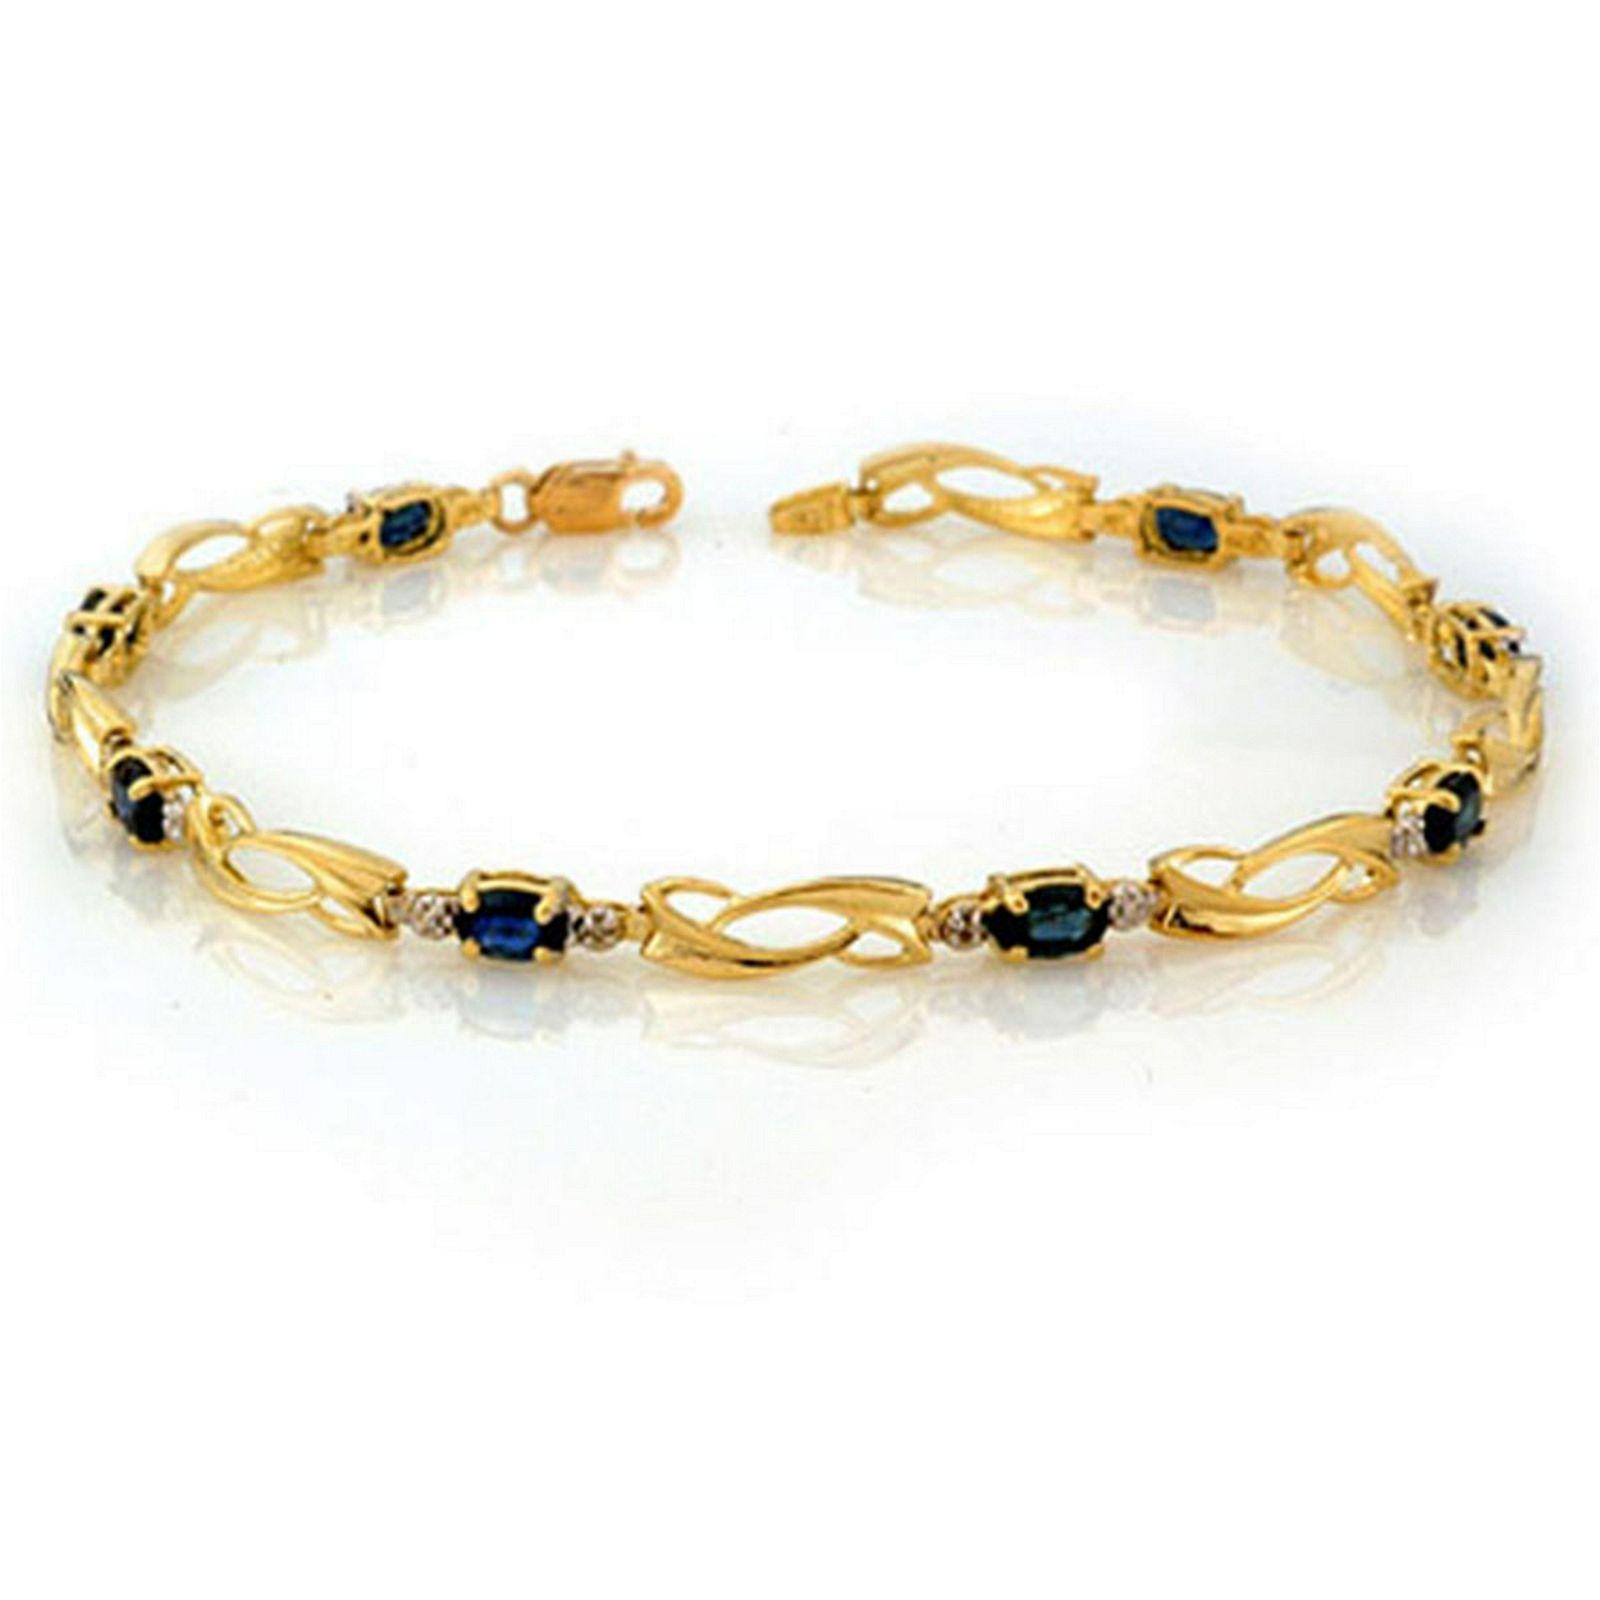 2.52 CTW Genuine Blue Sapphire & Diamond Bracelet 10K